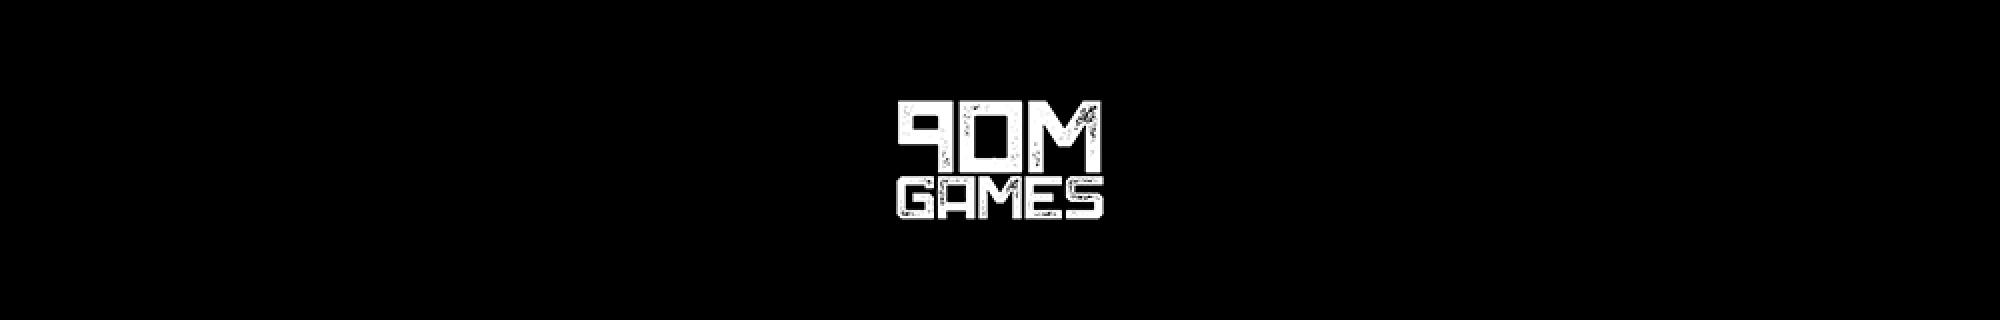 90M Games